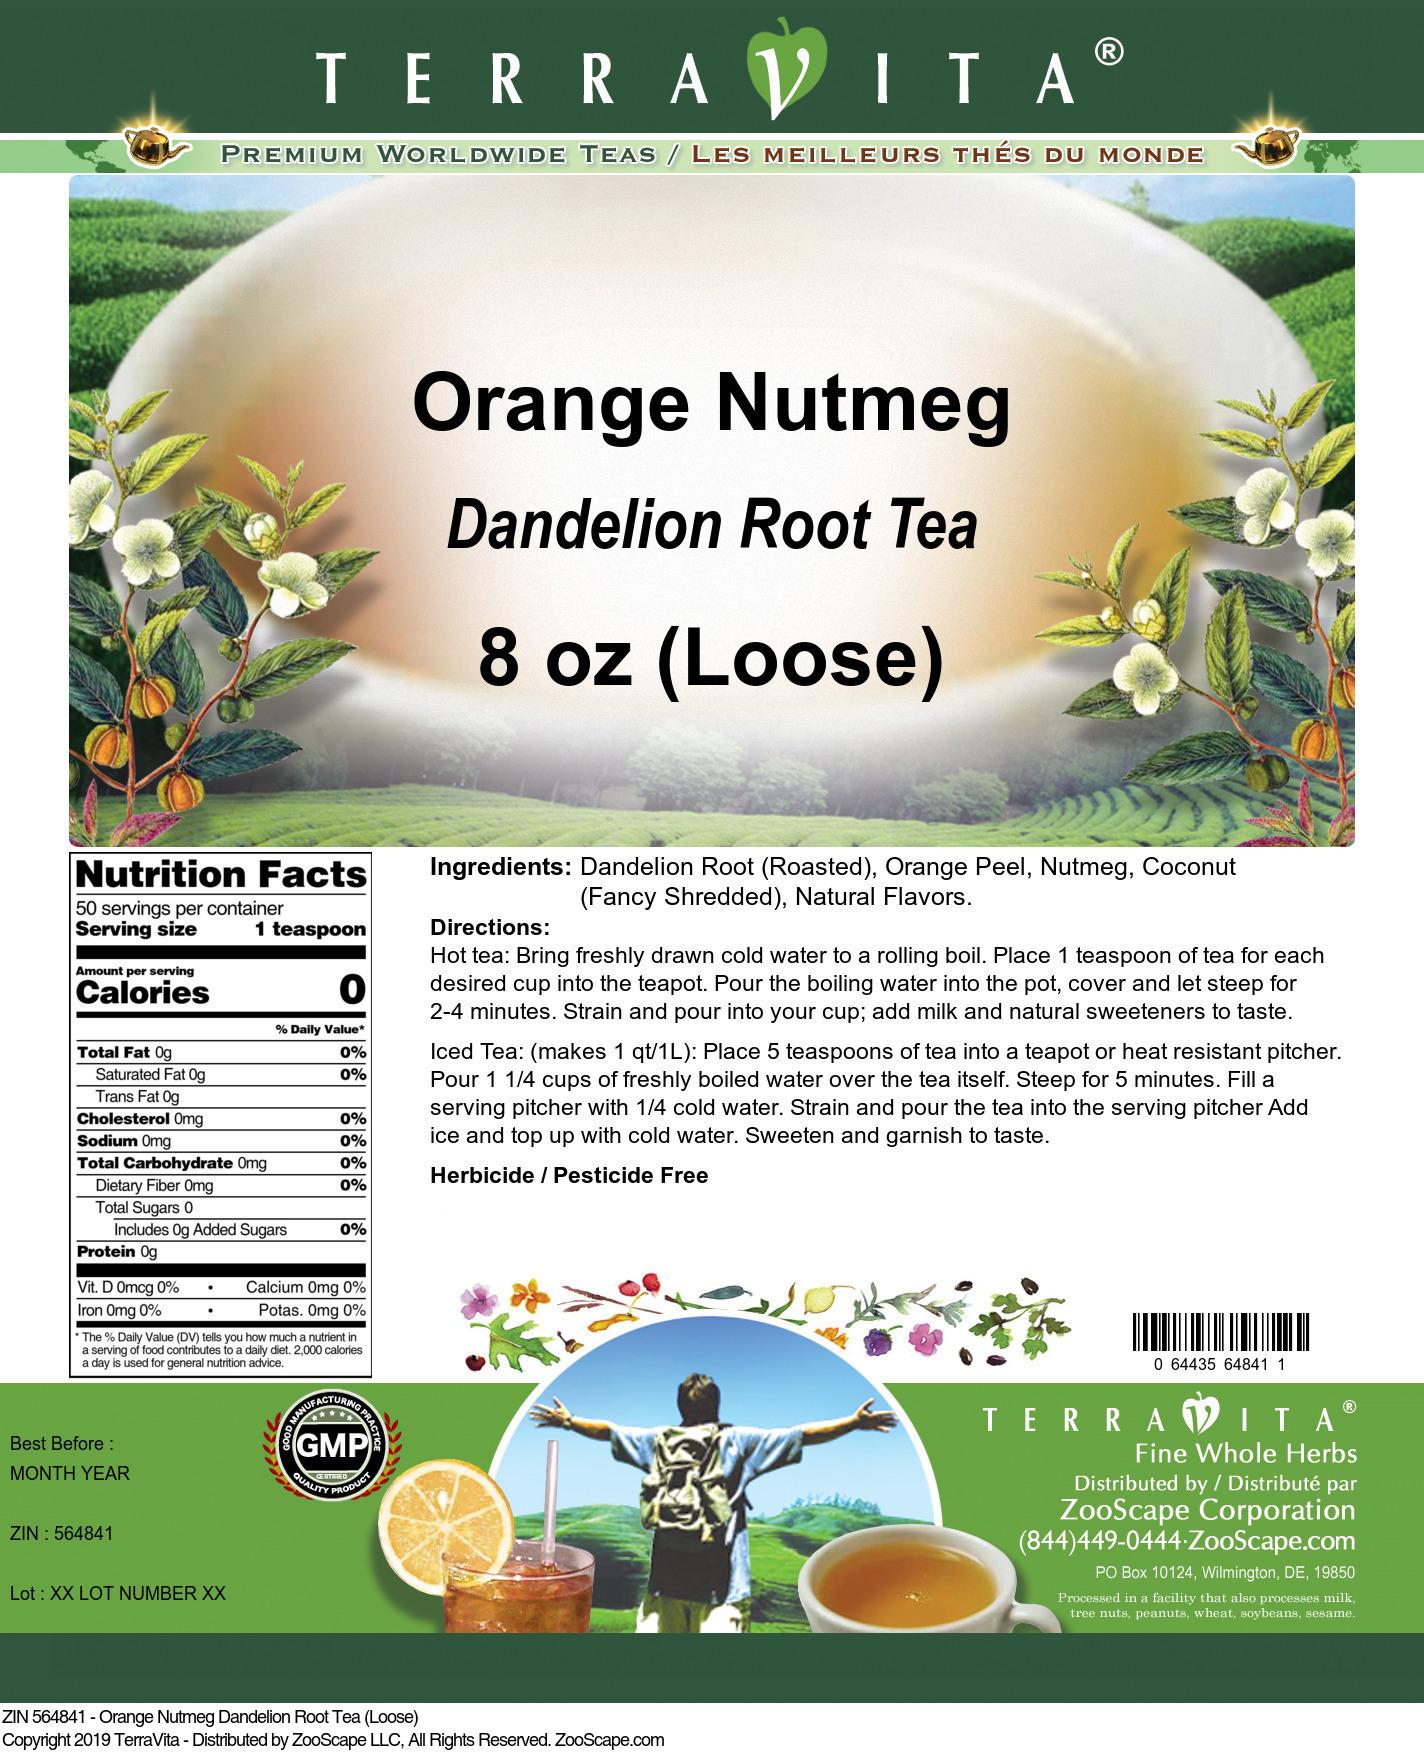 Orange Nutmeg Dandelion Root